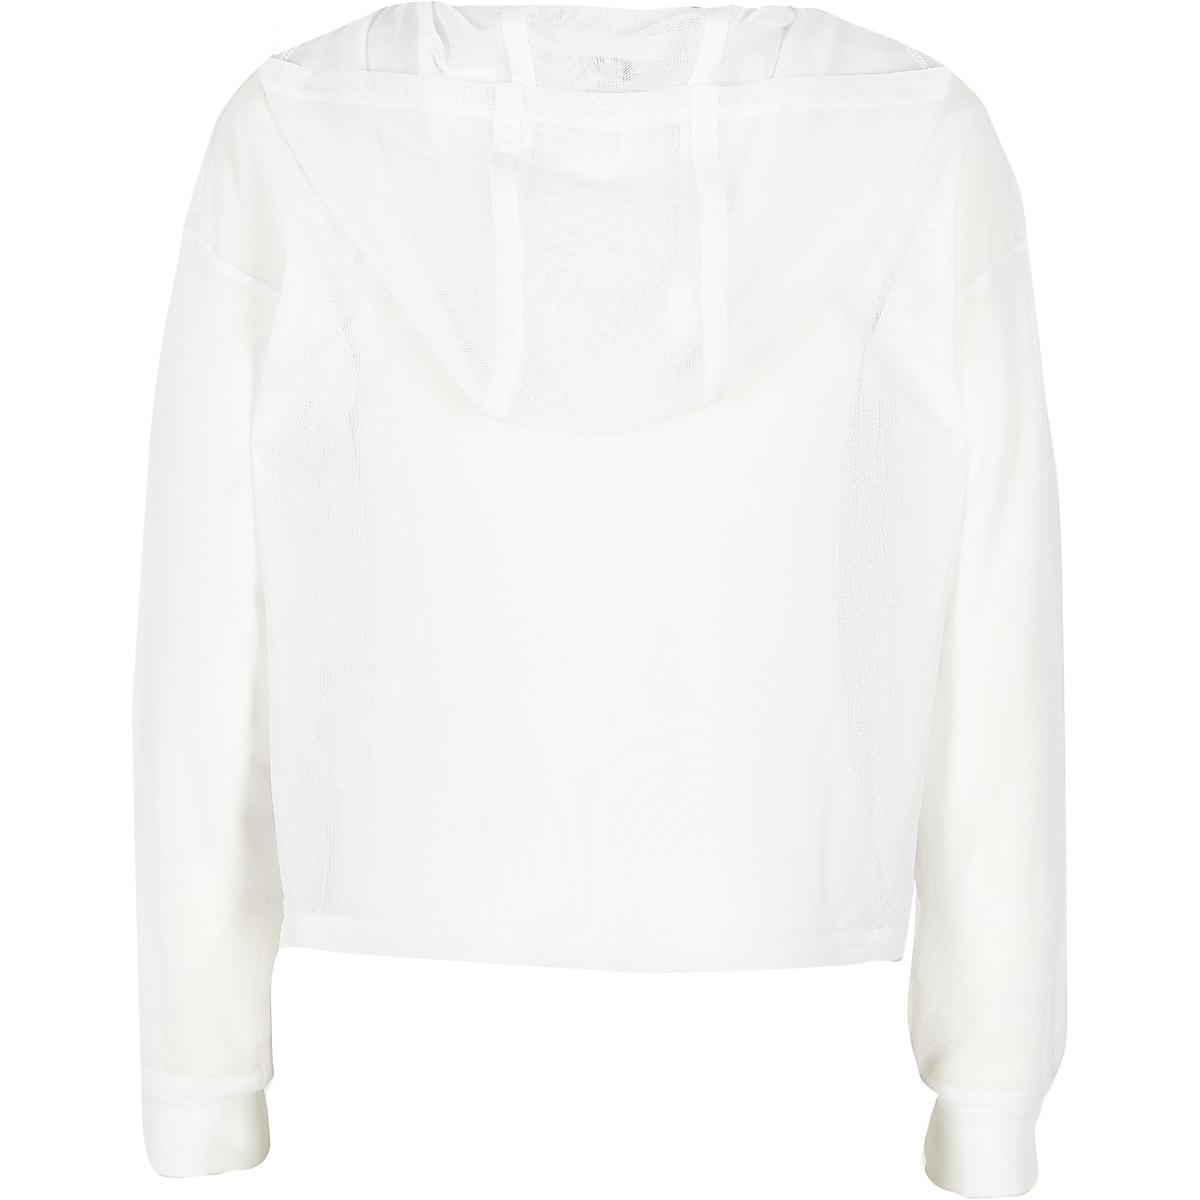 ab70c35621dfe Girls white mesh  Girl hero  cropped hoodie - Hoodies   Sweatshirts ...